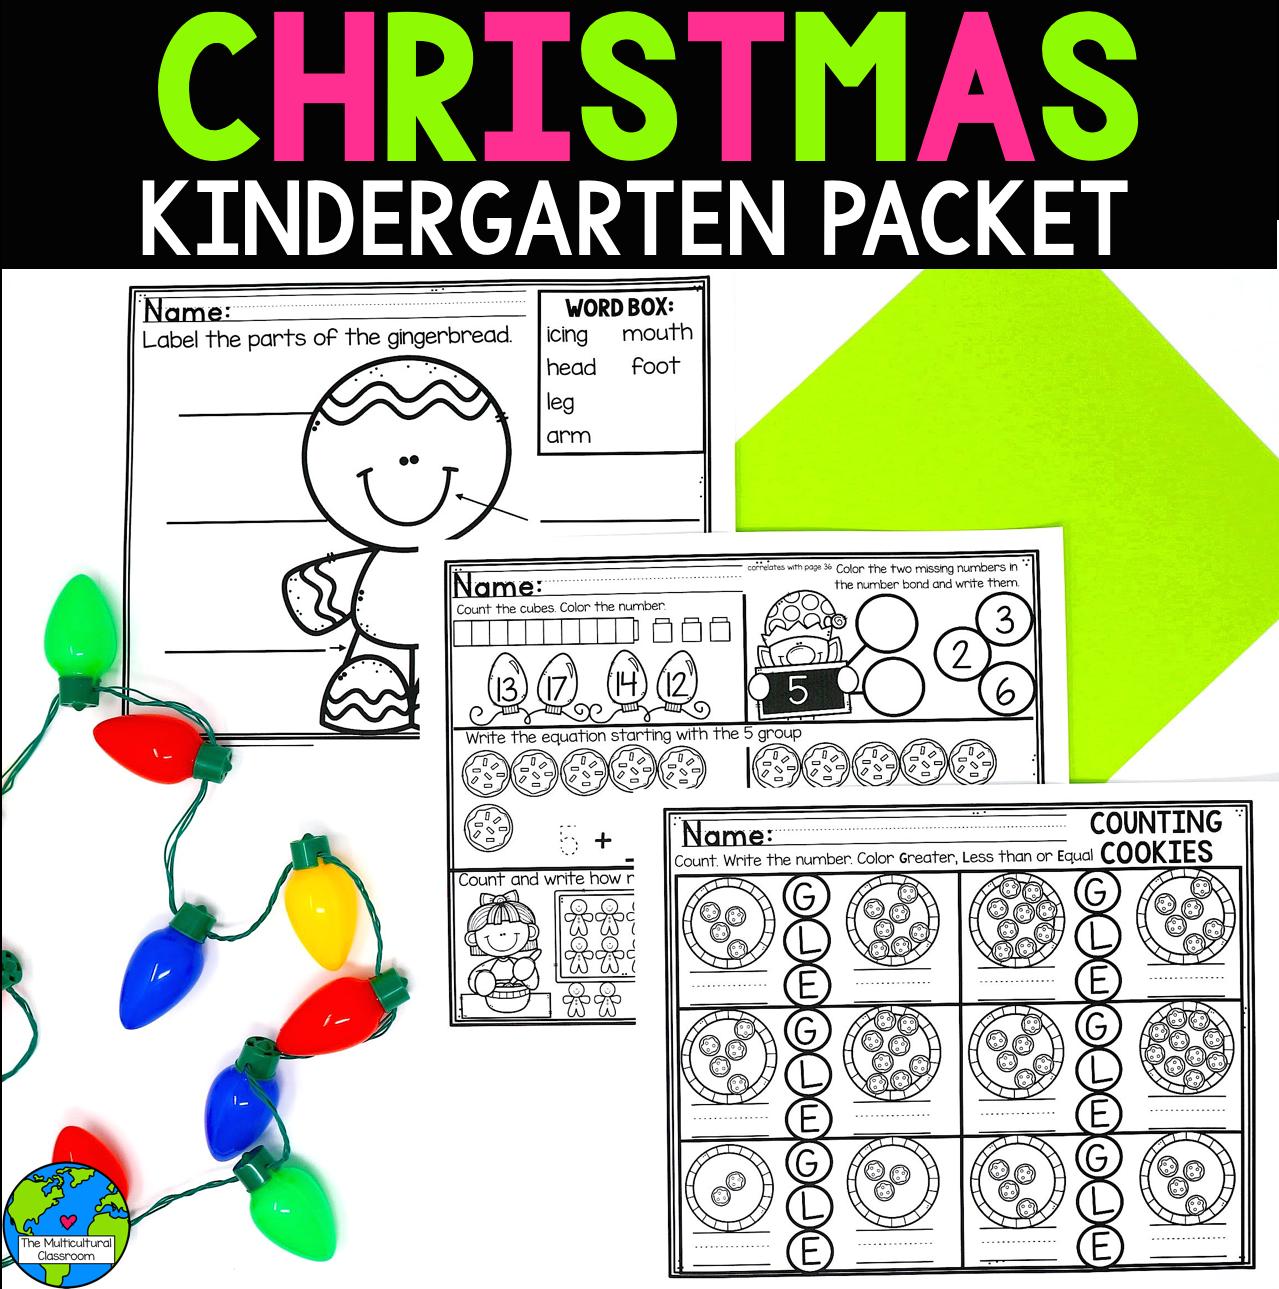 Christmas Kindergarten Worksheets Christmas Kindergarten Christmas Lesson Plan Christmas Lesson [ 1289 x 1279 Pixel ]